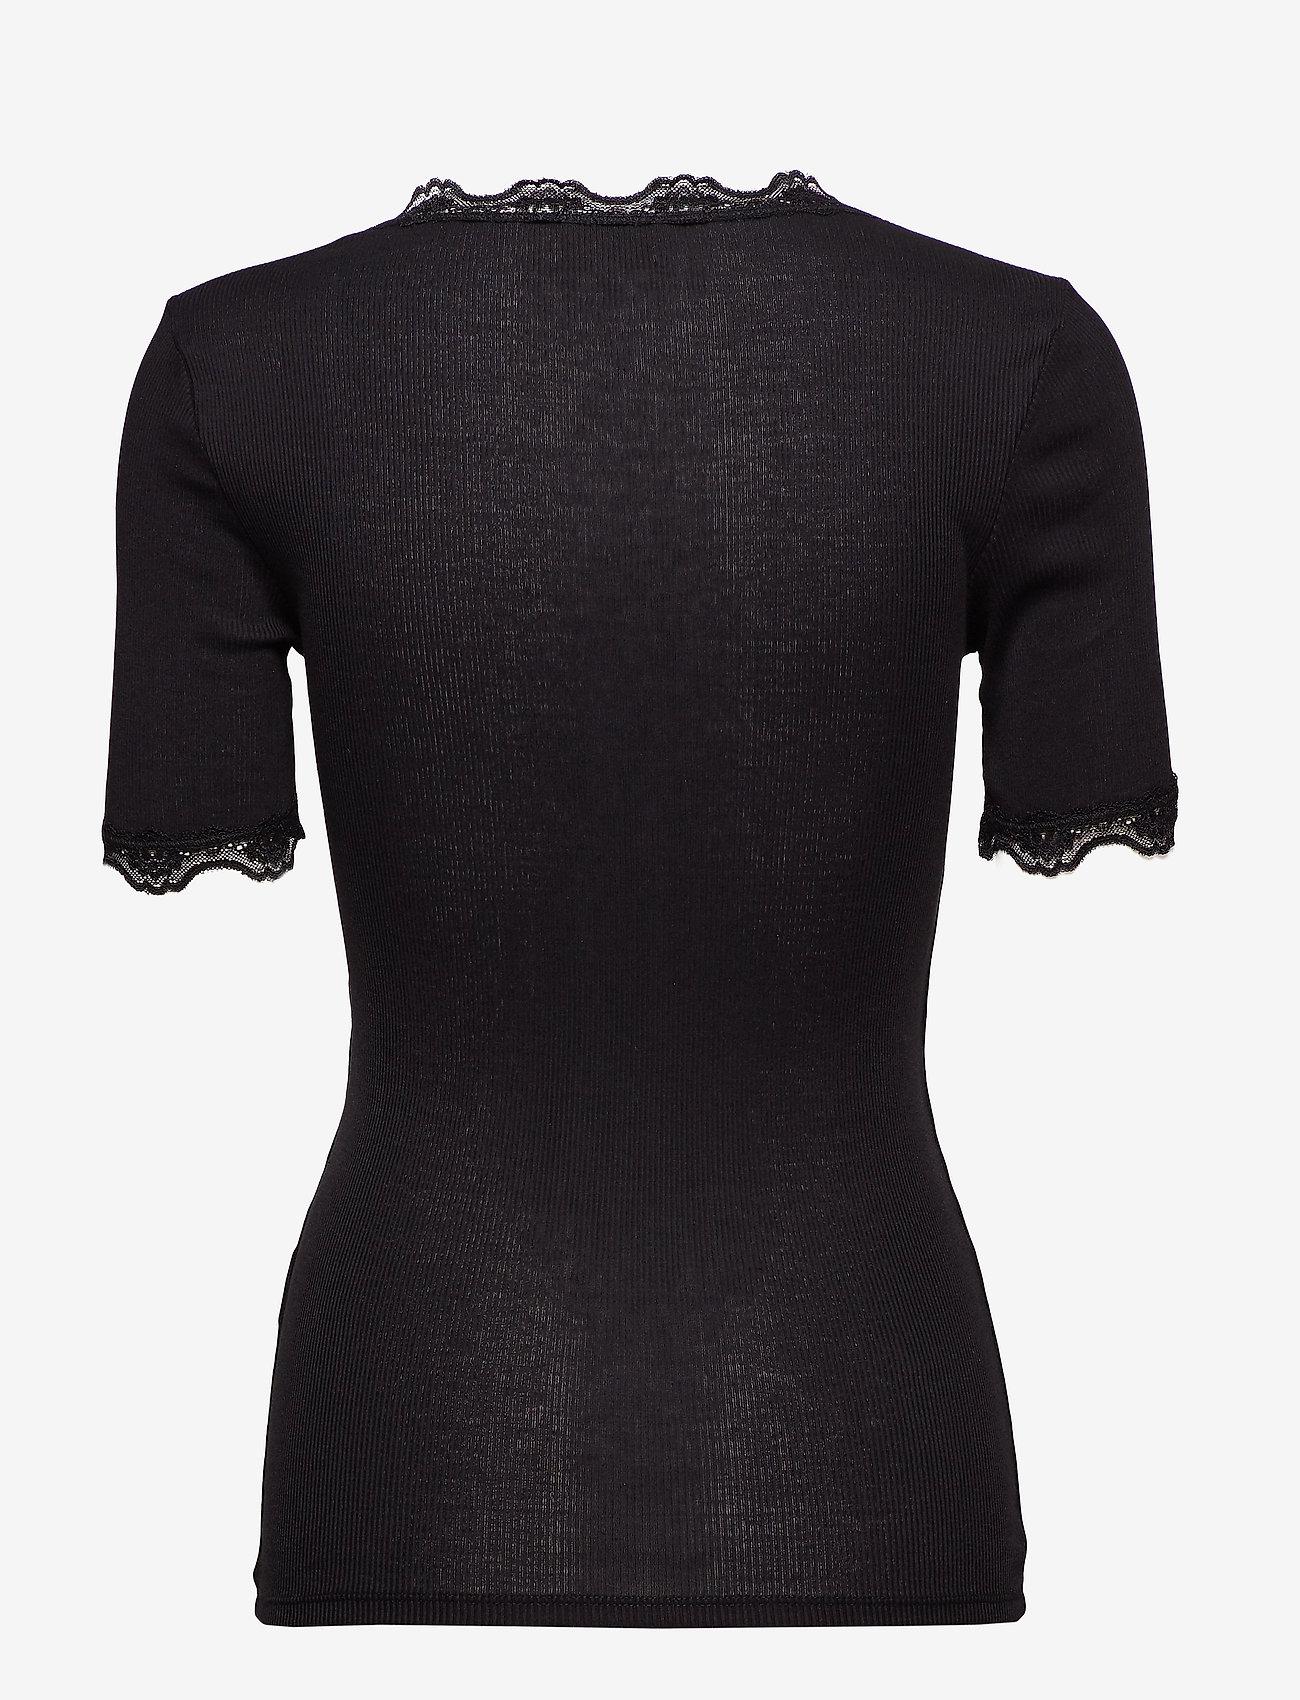 Minus - Ariel short sleeve - basic t-shirts - sort - 1